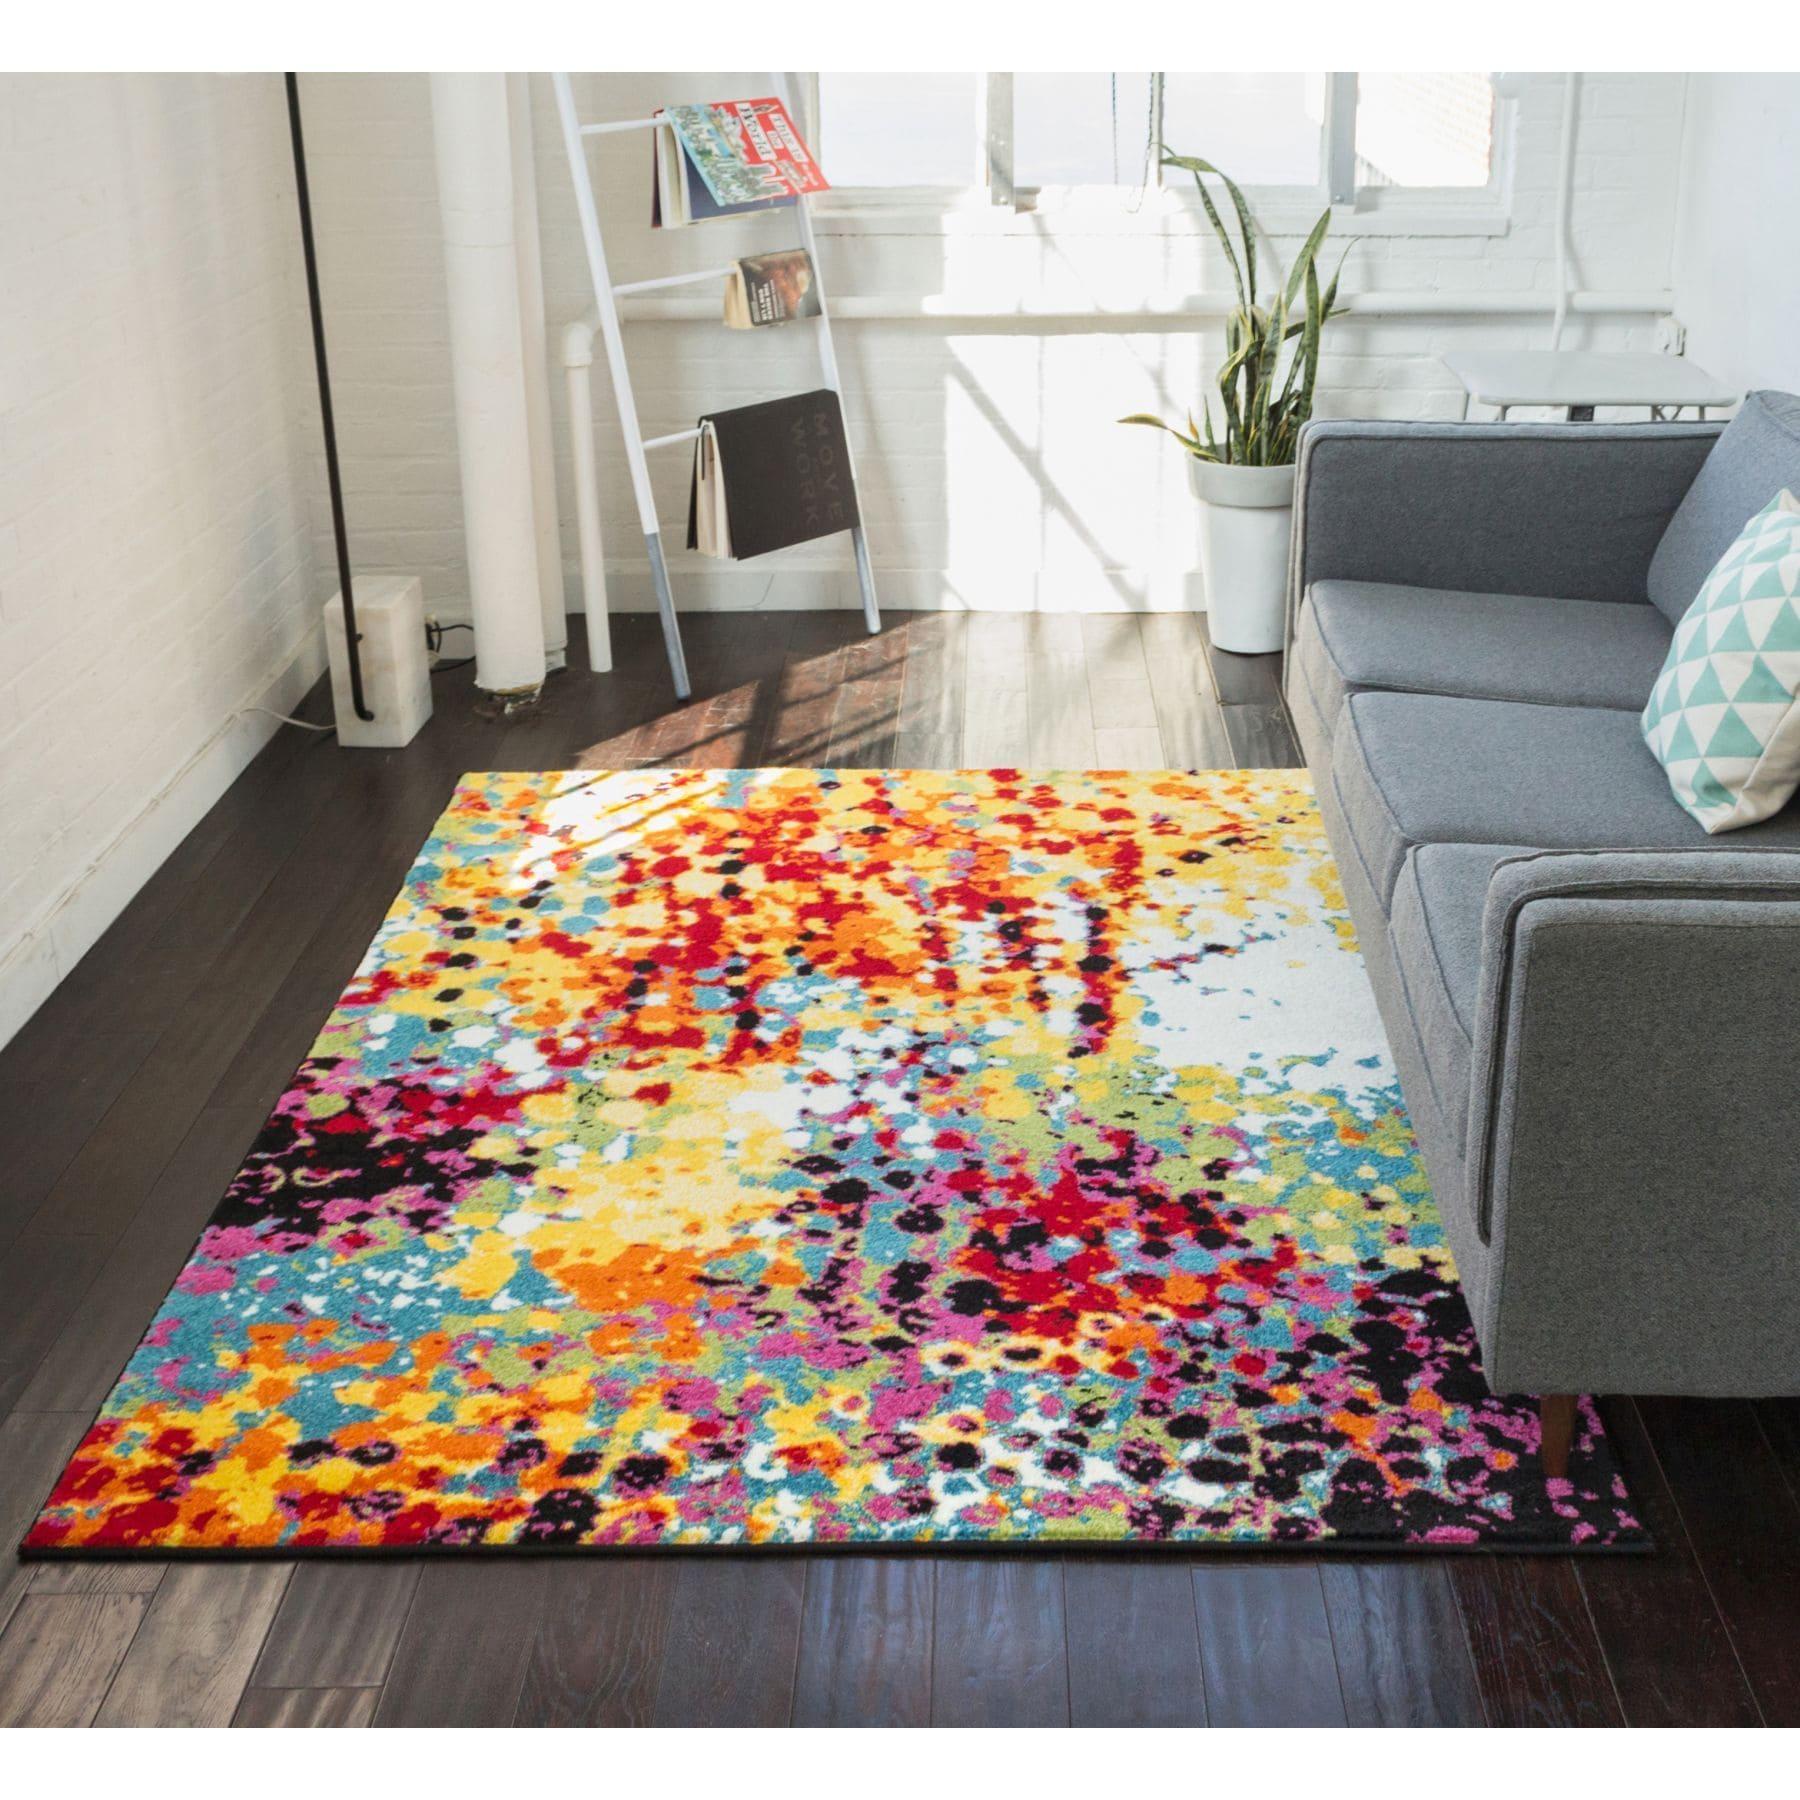 Well Woven Modern Bright Paint Splash Abstract Multi Area Rug 53